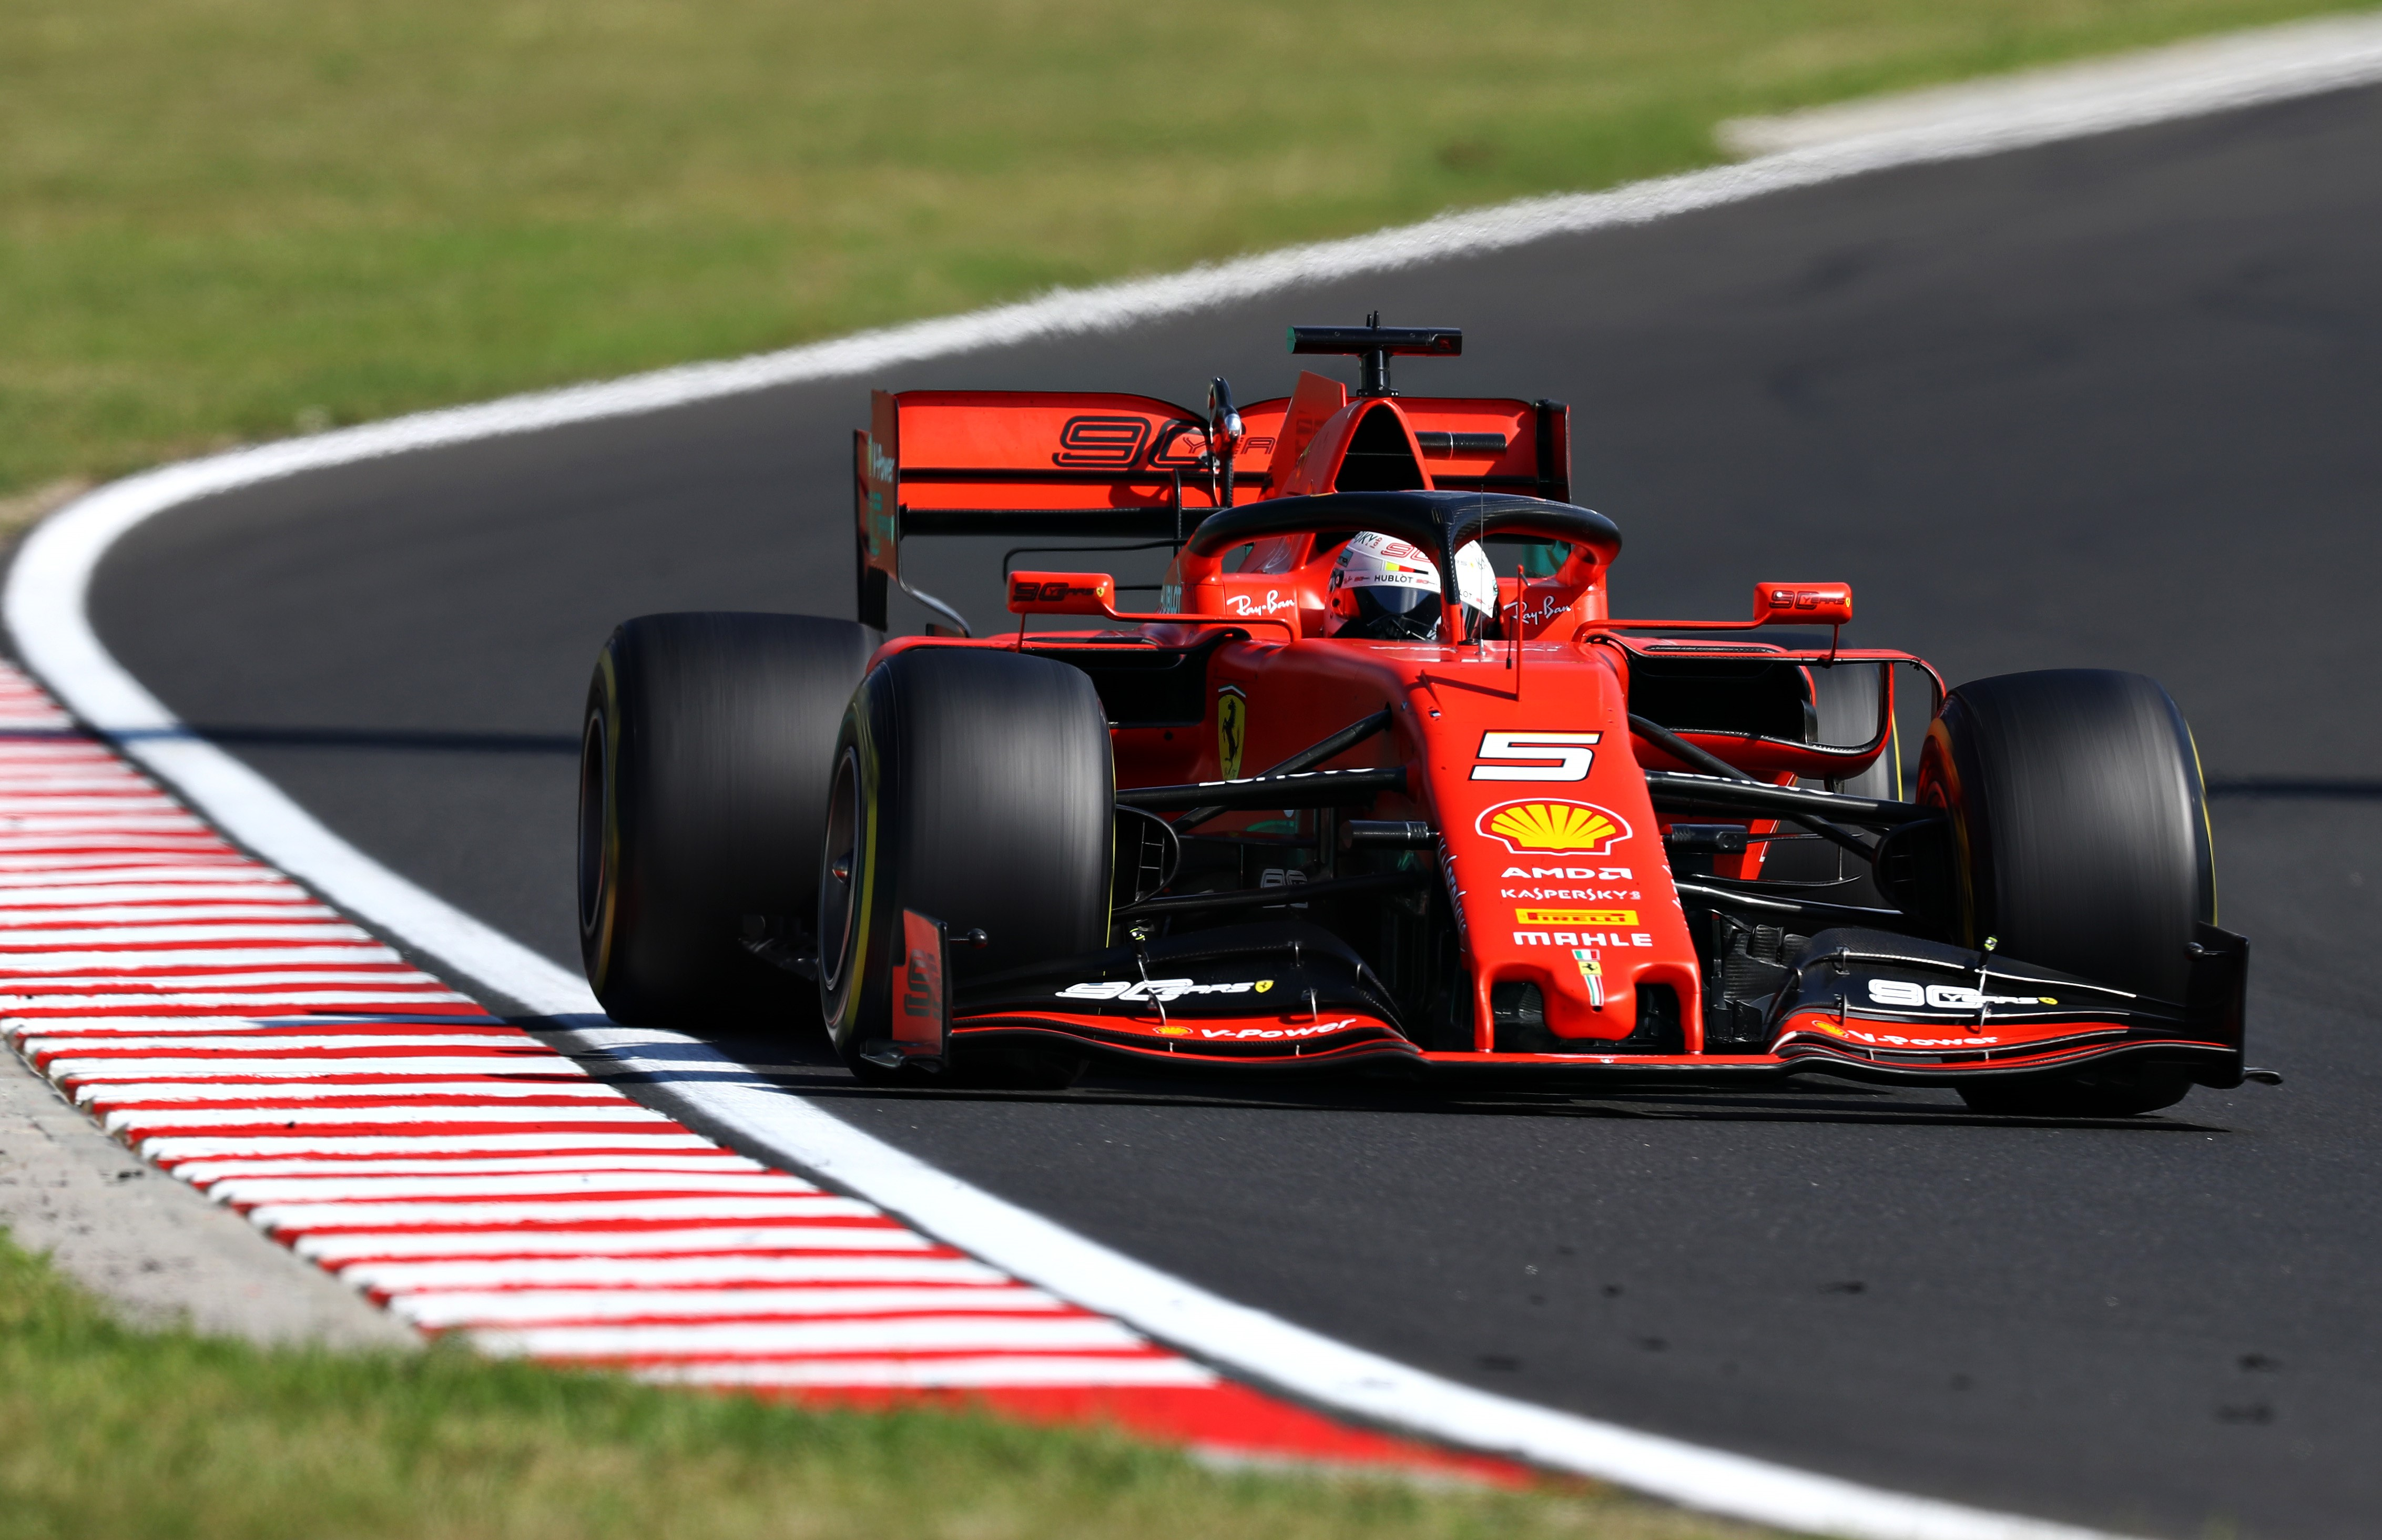 Sebastian Vettel (Ferrari) lors du Grand Prix de Hongrie 2019